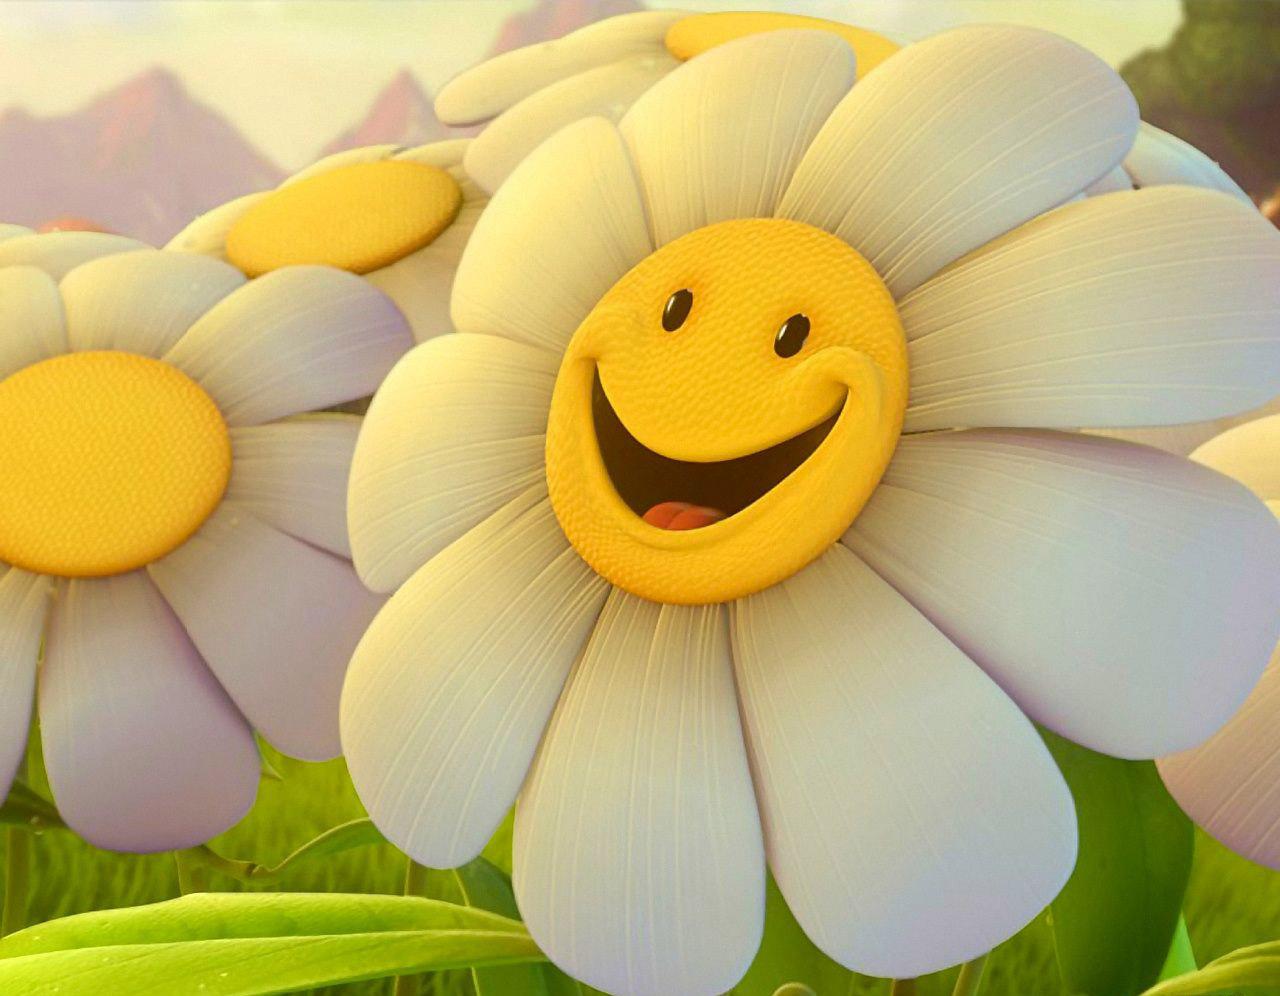 http://1.bp.blogspot.com/-wUpWMNk2FLY/UIQjwdlAPXI/AAAAAAAAA34/9vtTmAXbgRk/s1600/3d-pictures-smile-is-cute-flowers.jpg